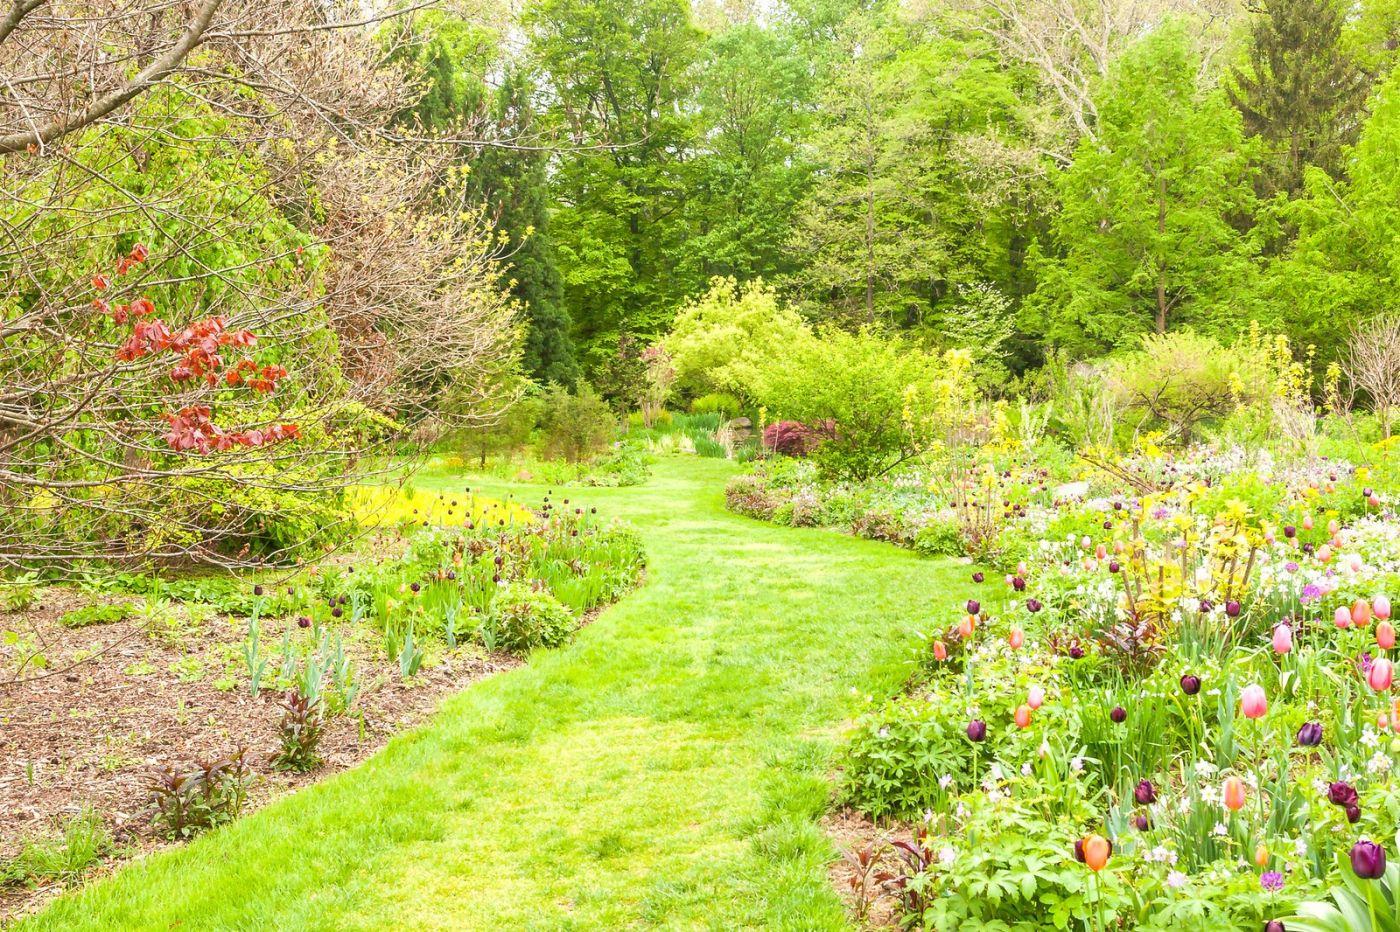 Chanticleer花园,融入自然_图1-38